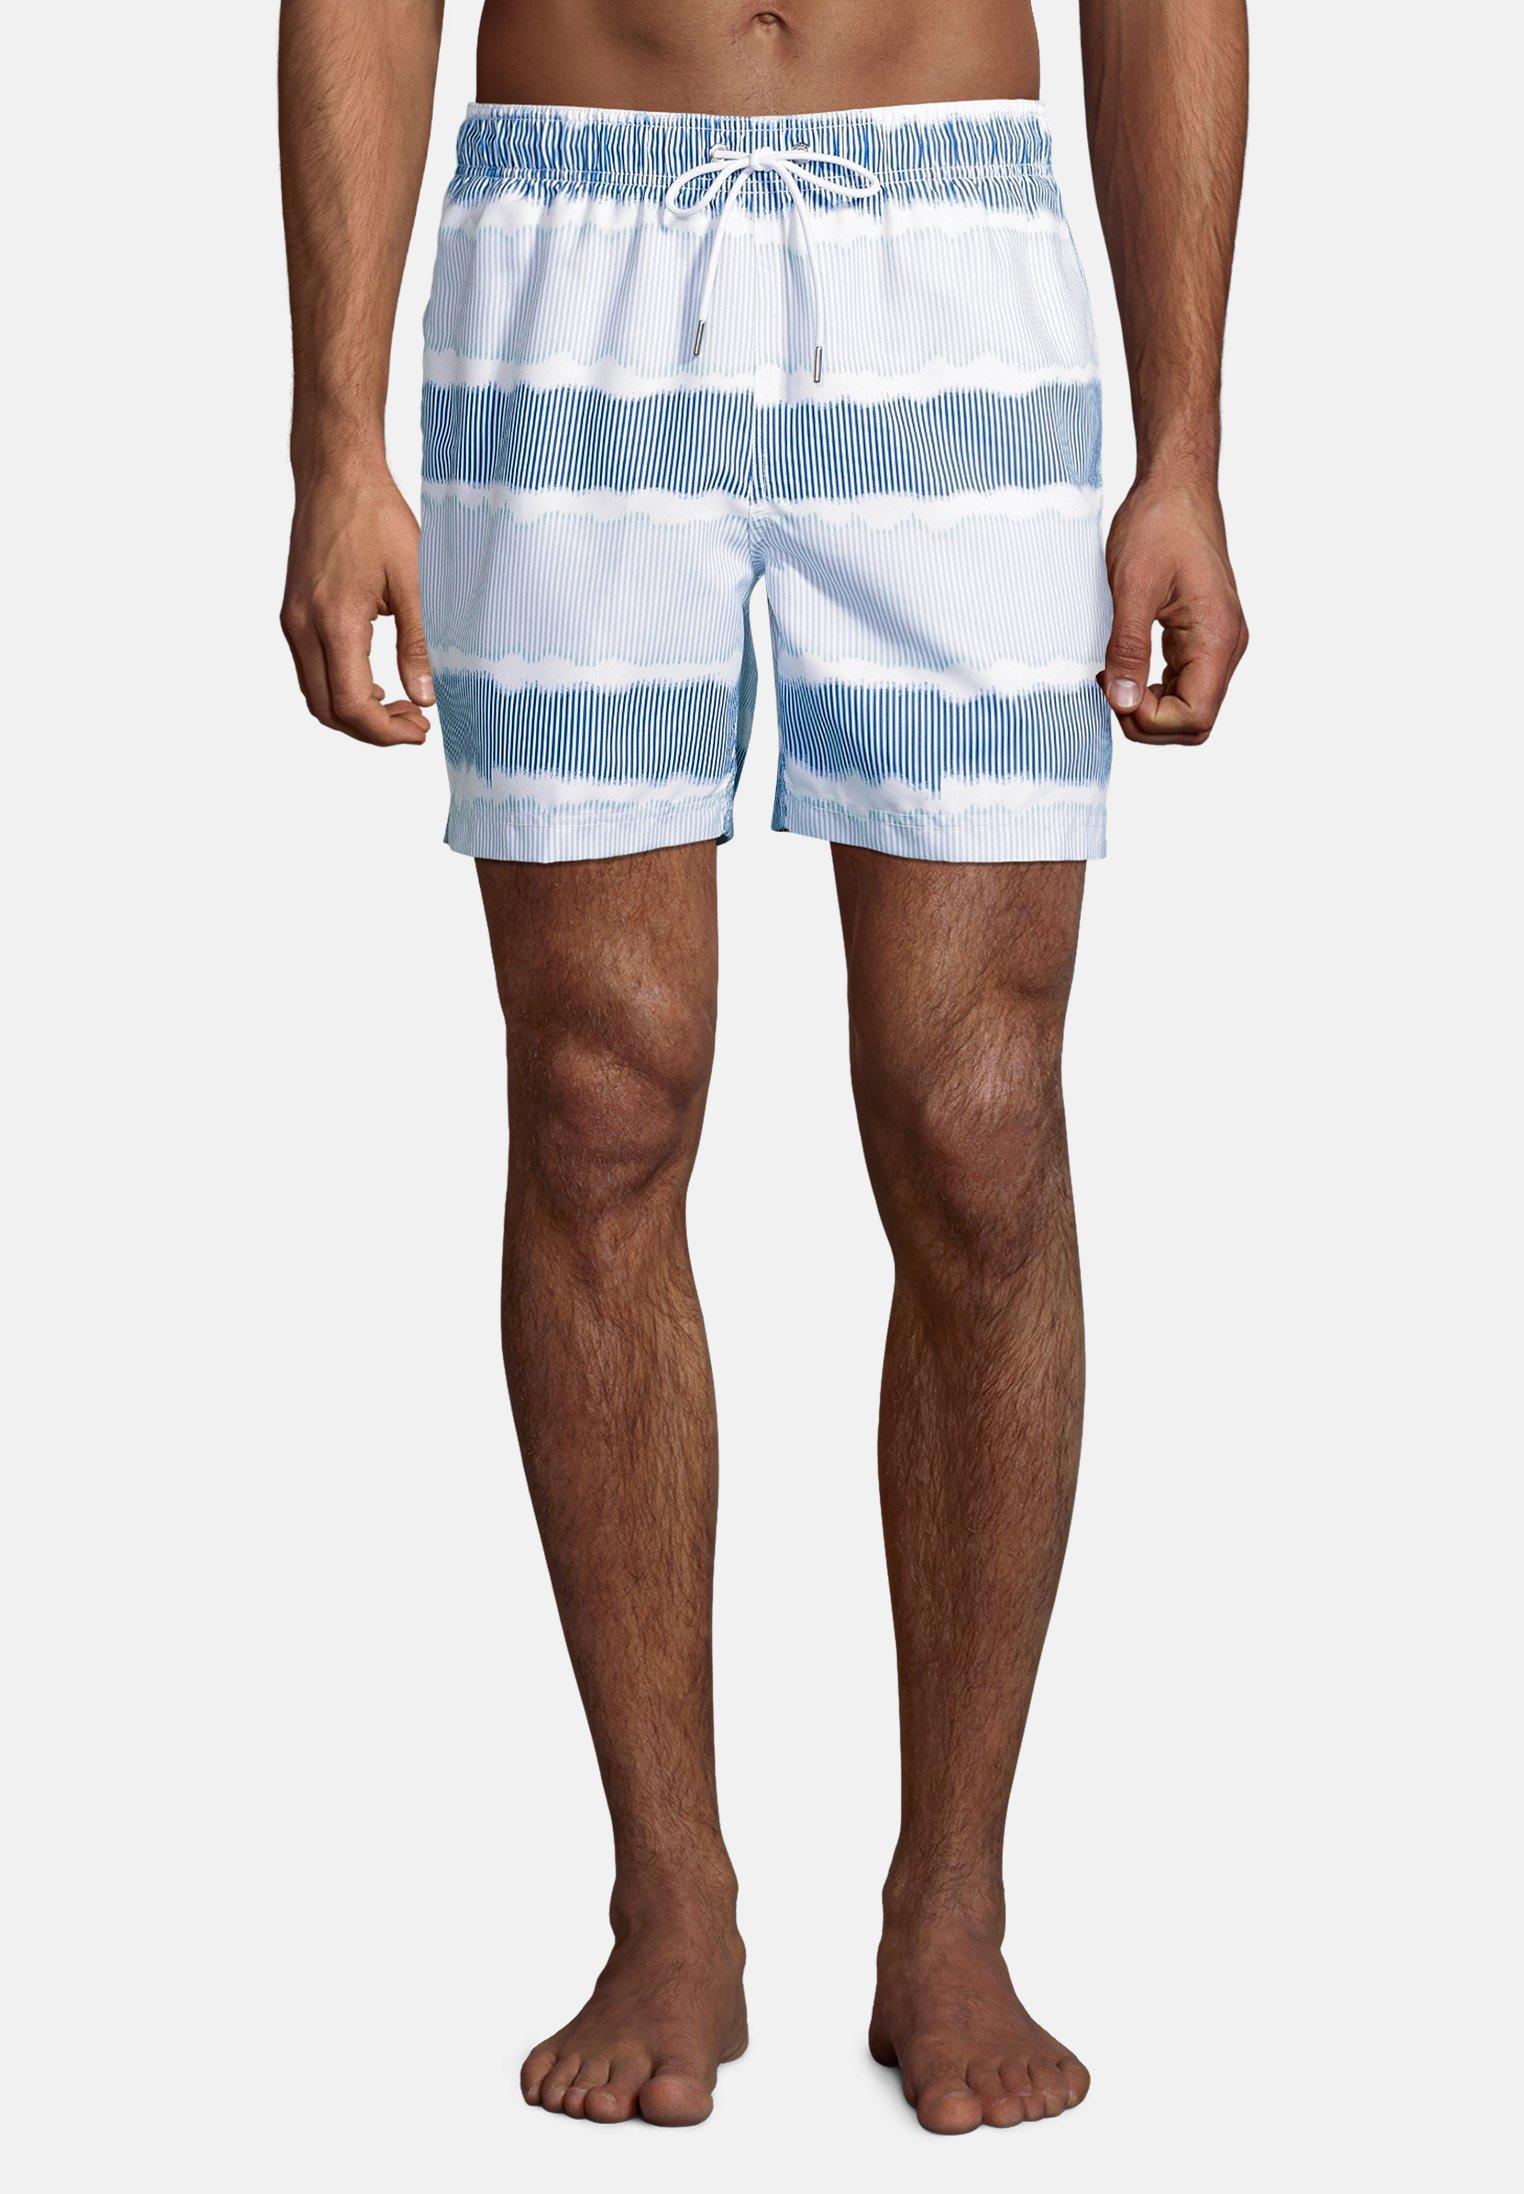 Herren Badeshorts - blue-white dyed stripe